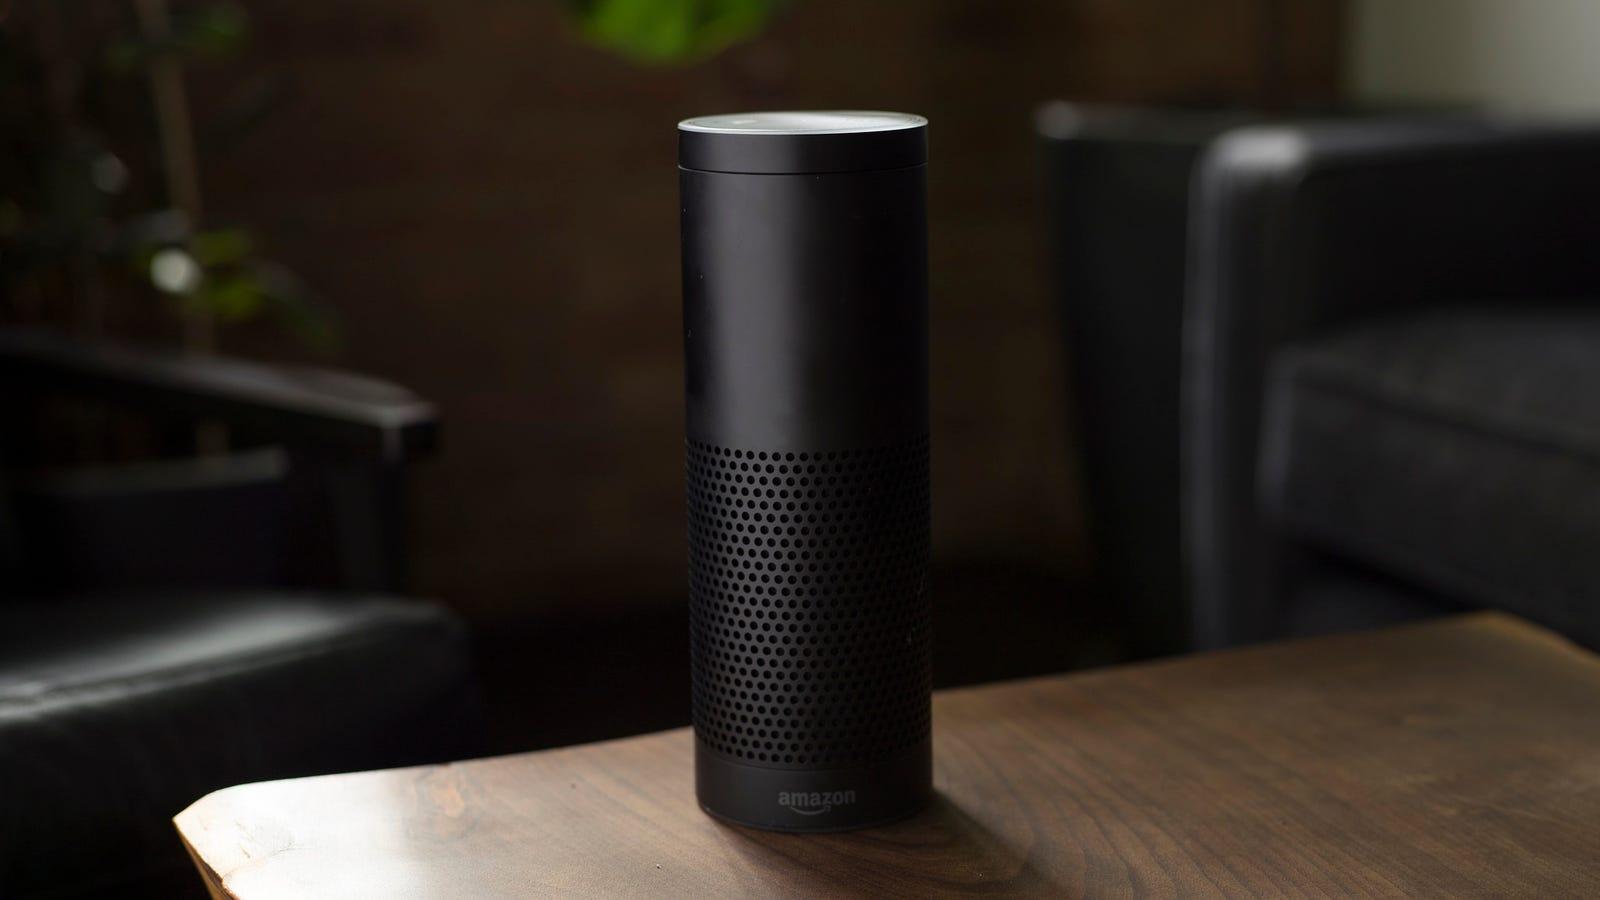 How to Change Alexa's Wake Word to Something Other Than 'Alexa'